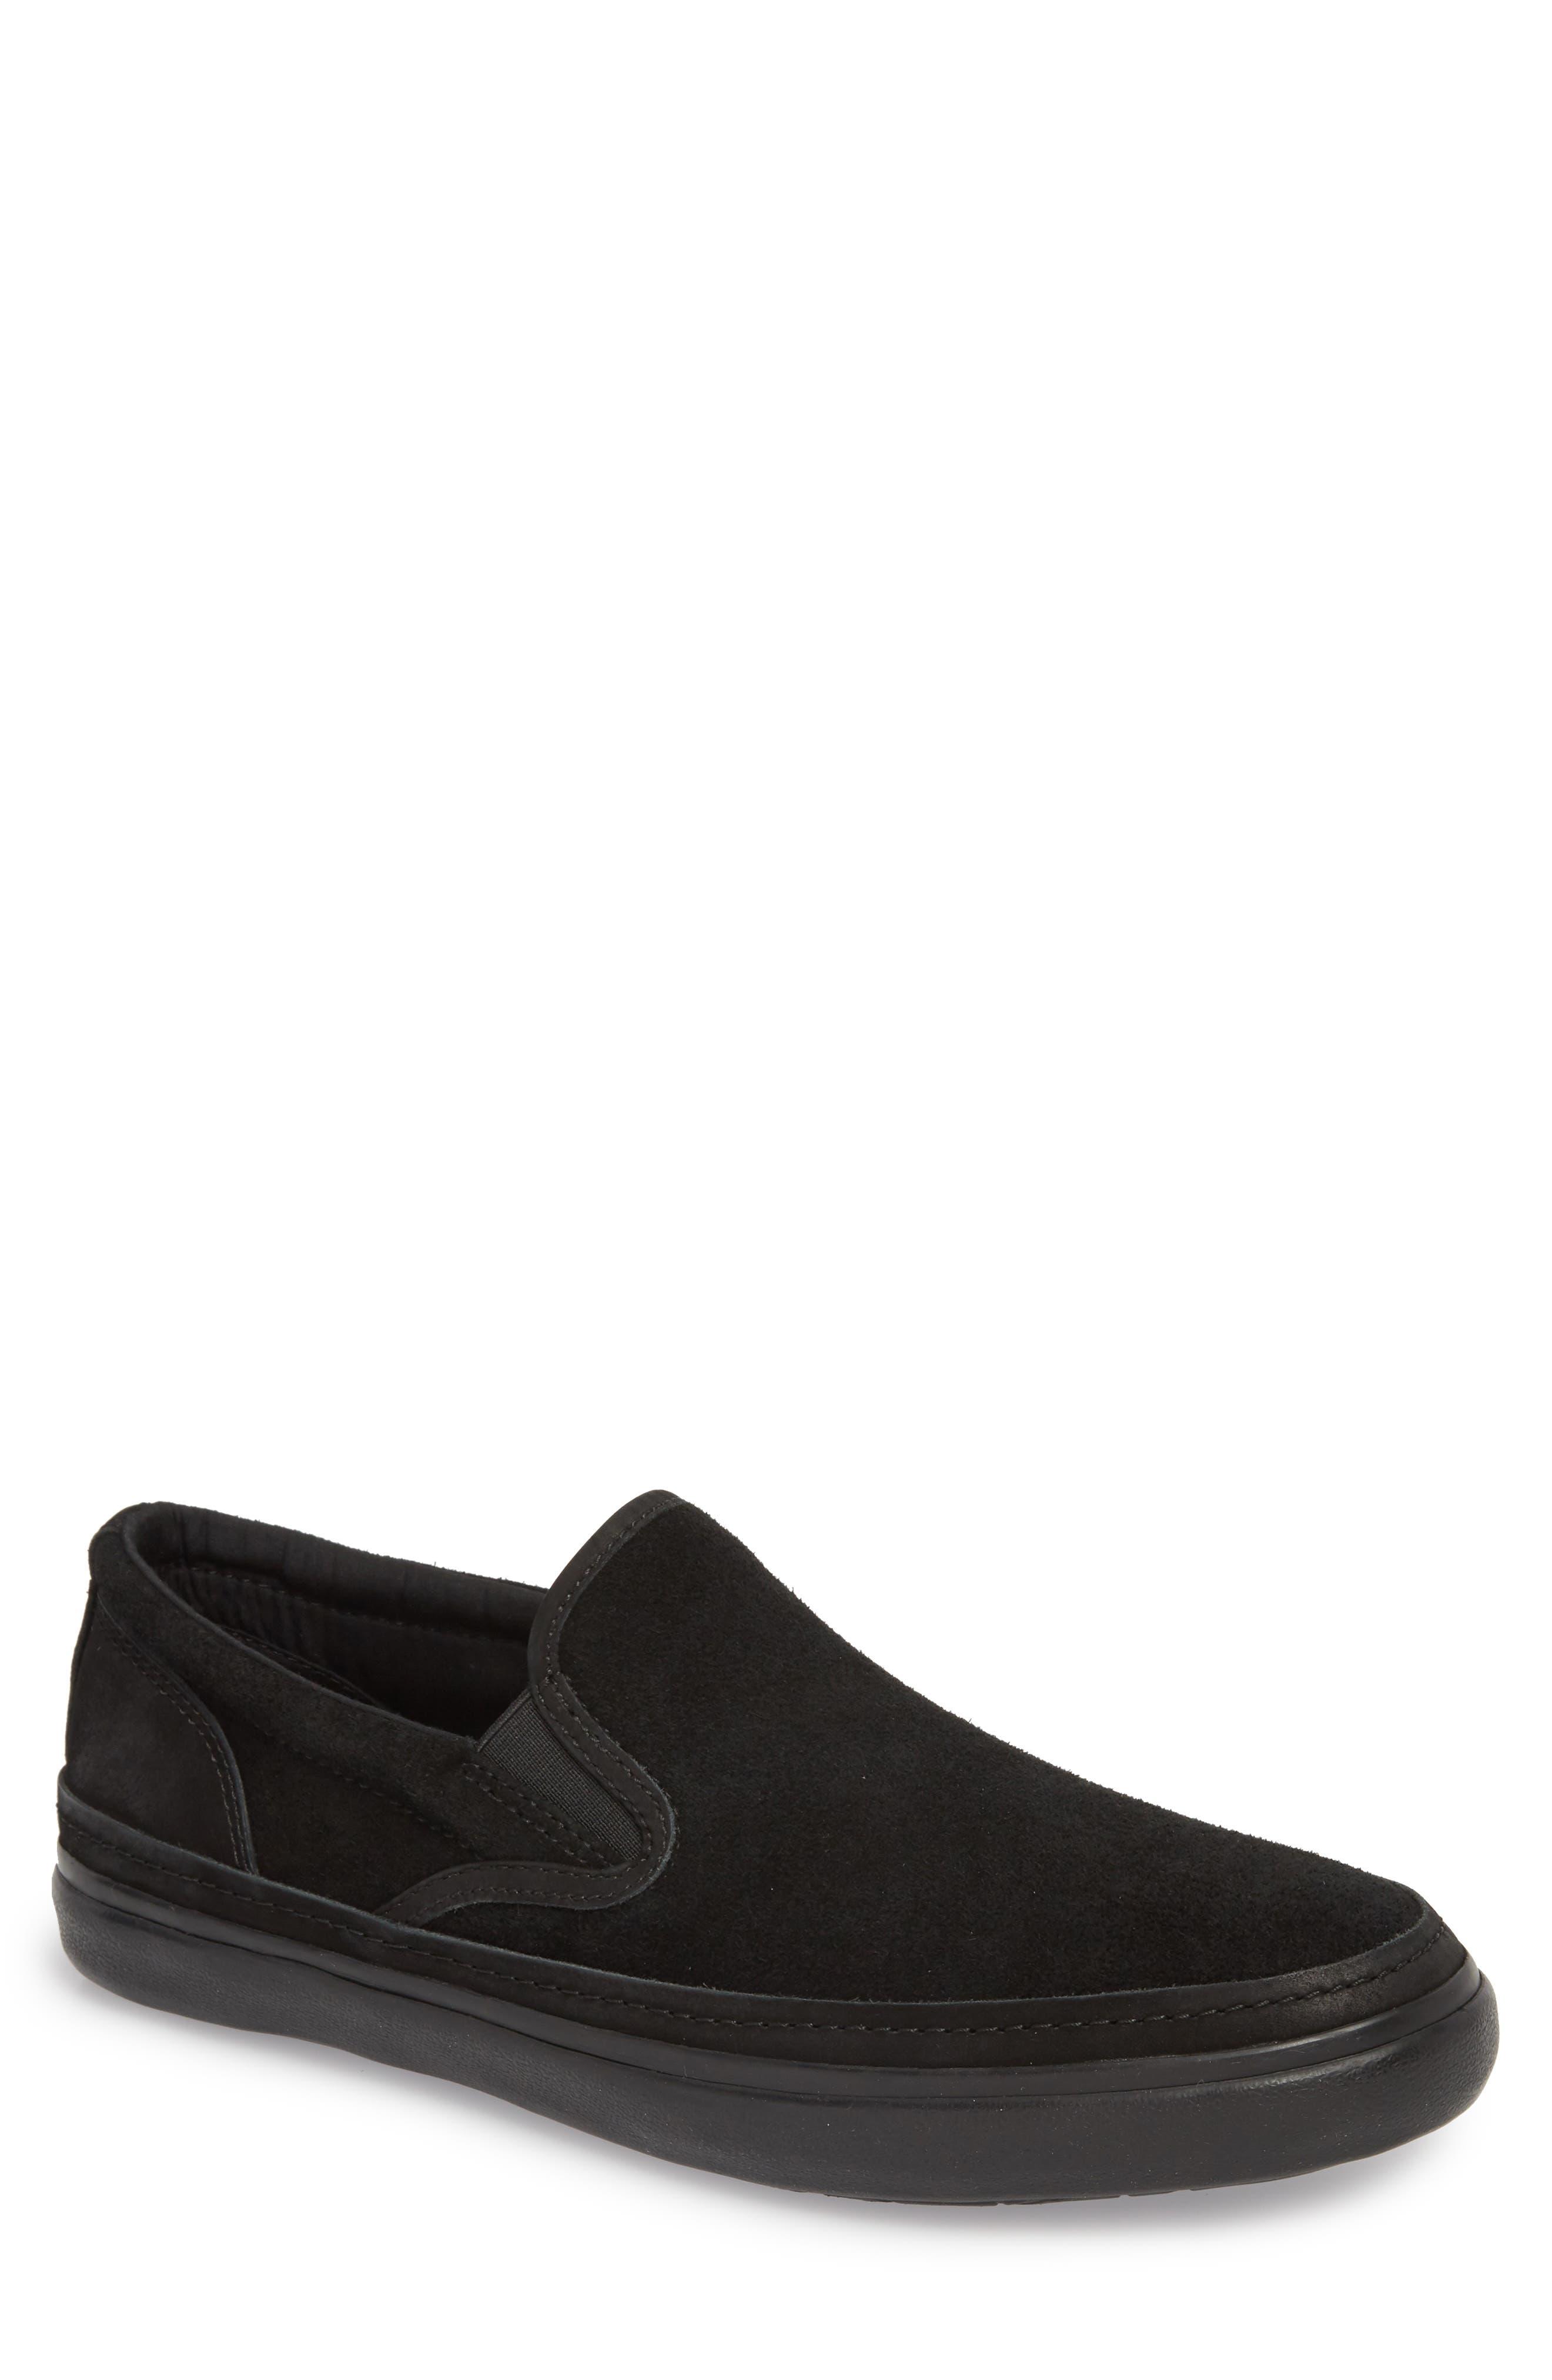 Suede Jet Slip-On Sneaker,                         Main,                         color, BLACK SUEDE